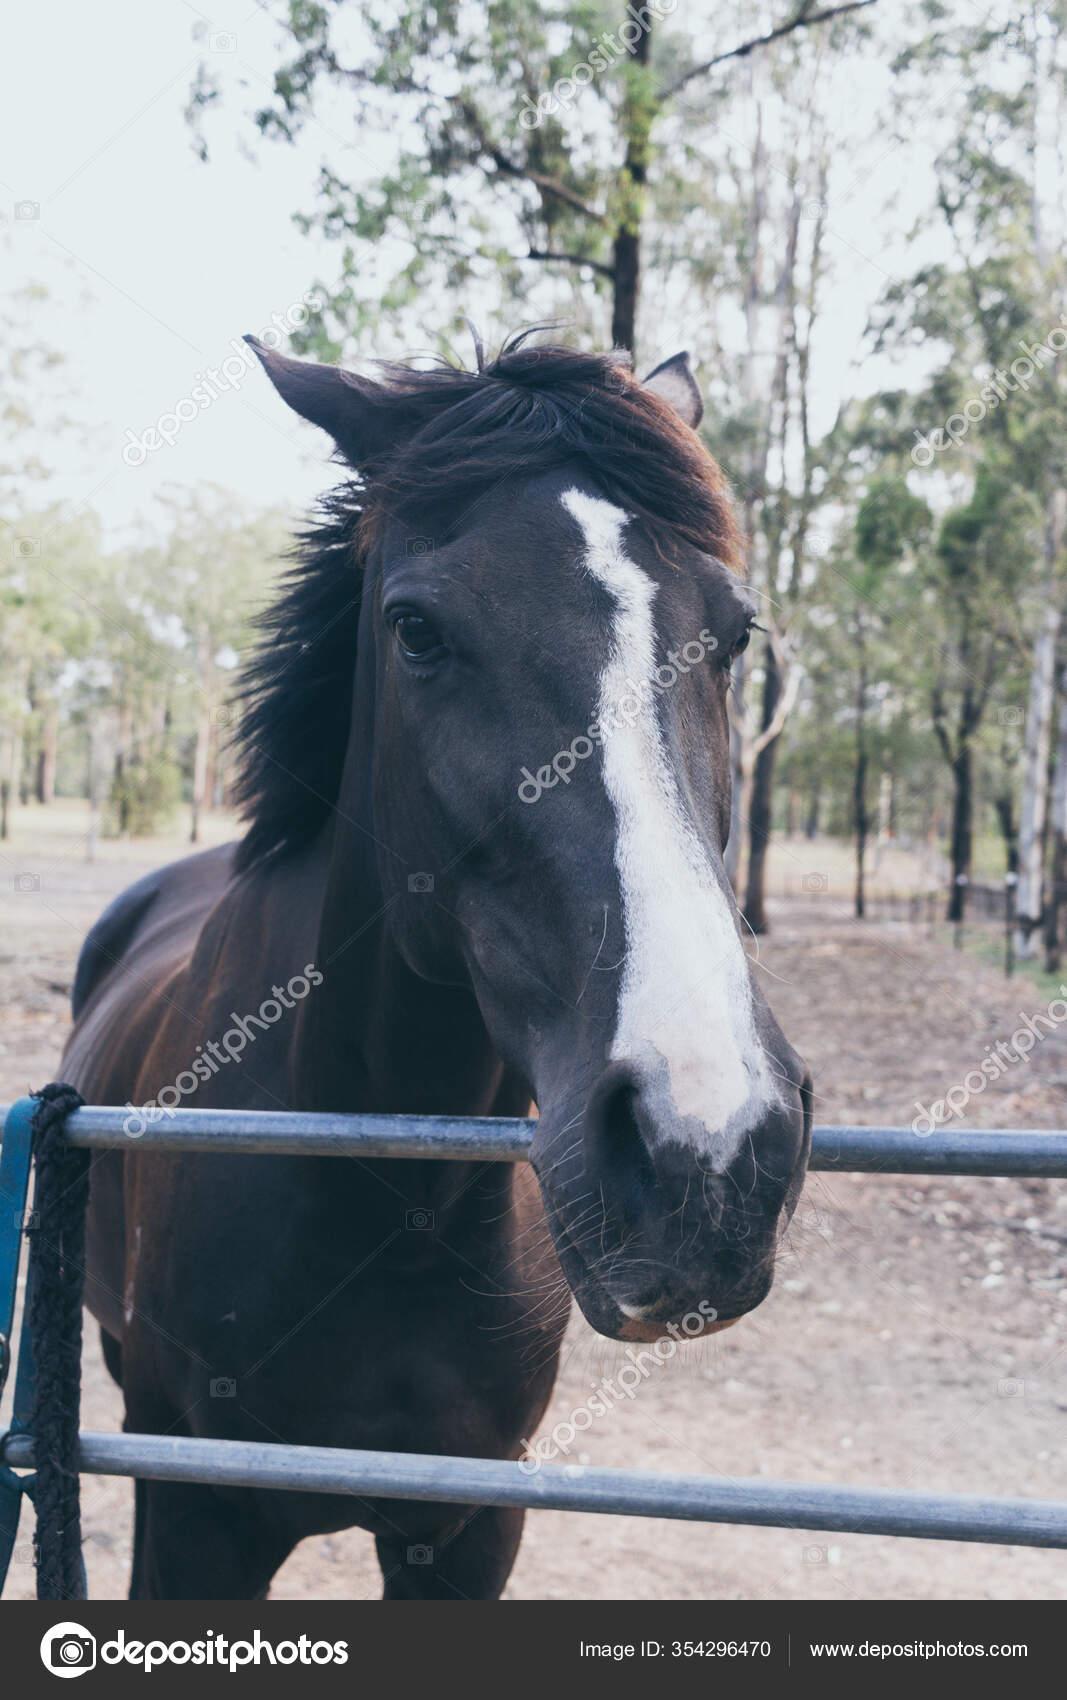 Beautiful Black Horse White Stain Forehead Wild Ranch Spanish Horse Stock Photo C Yaizahigueras 354296470